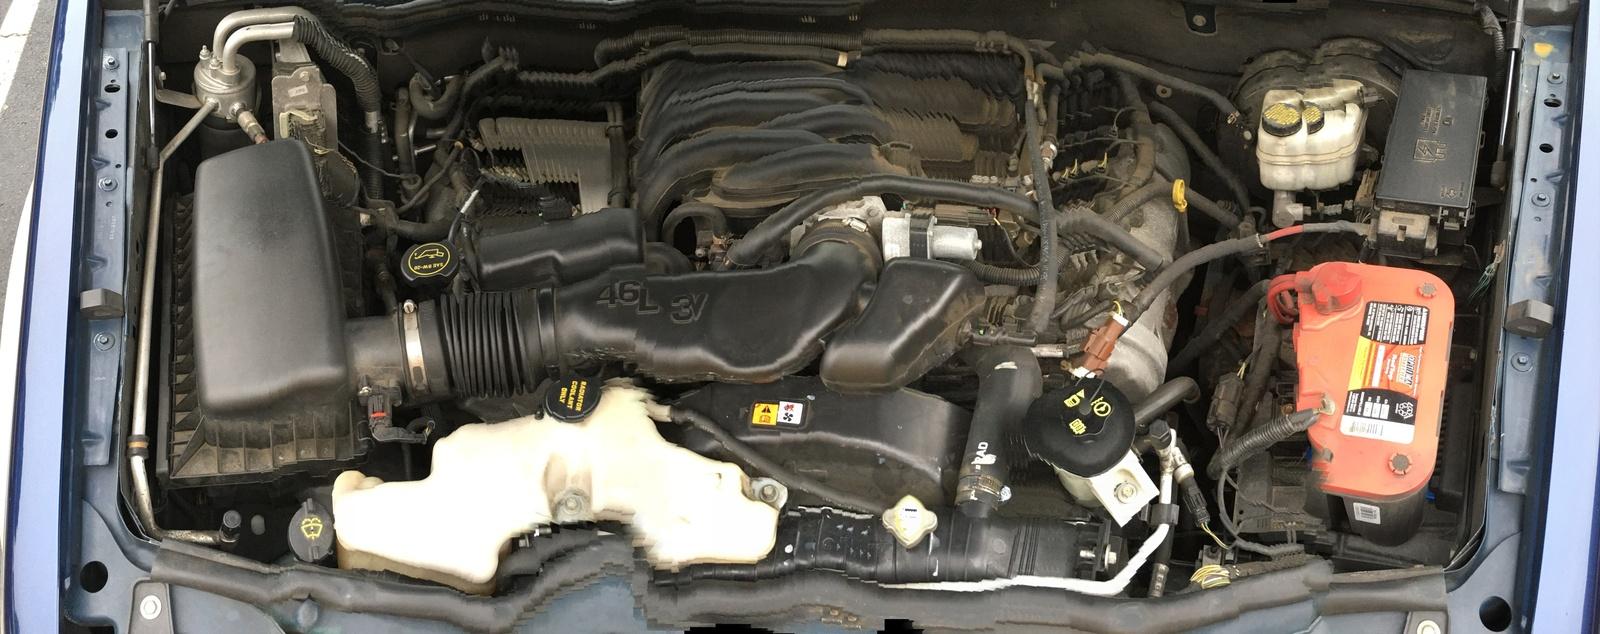 Ford Explorer Questions - Low Pressure Port - CarGurus